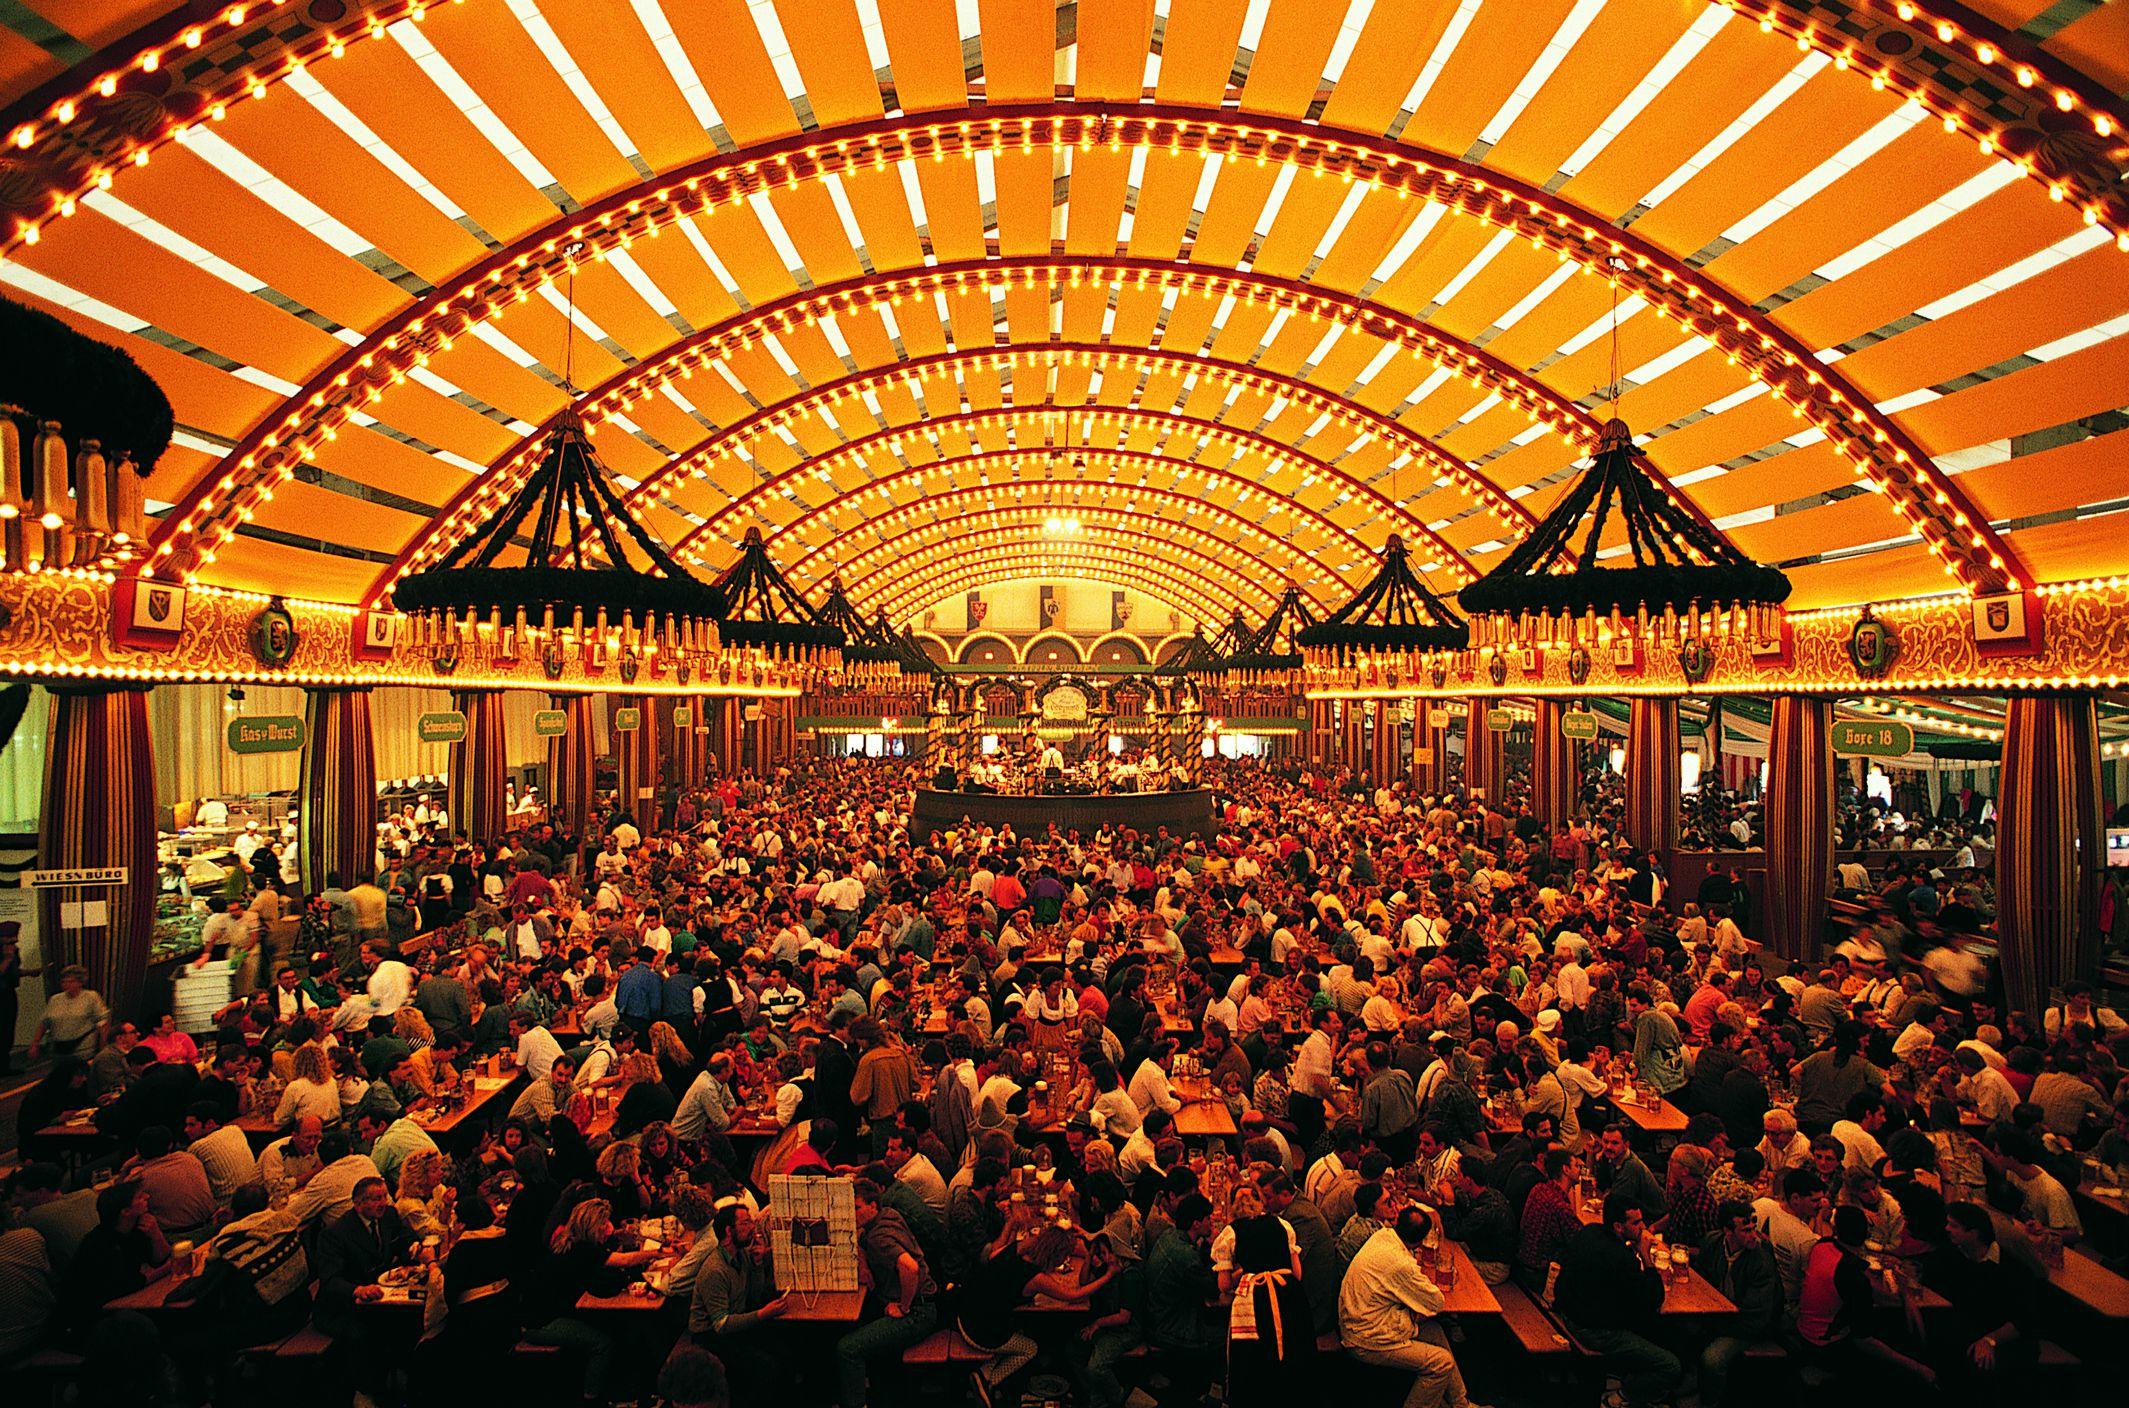 Oktoberfest celebration in Munich.